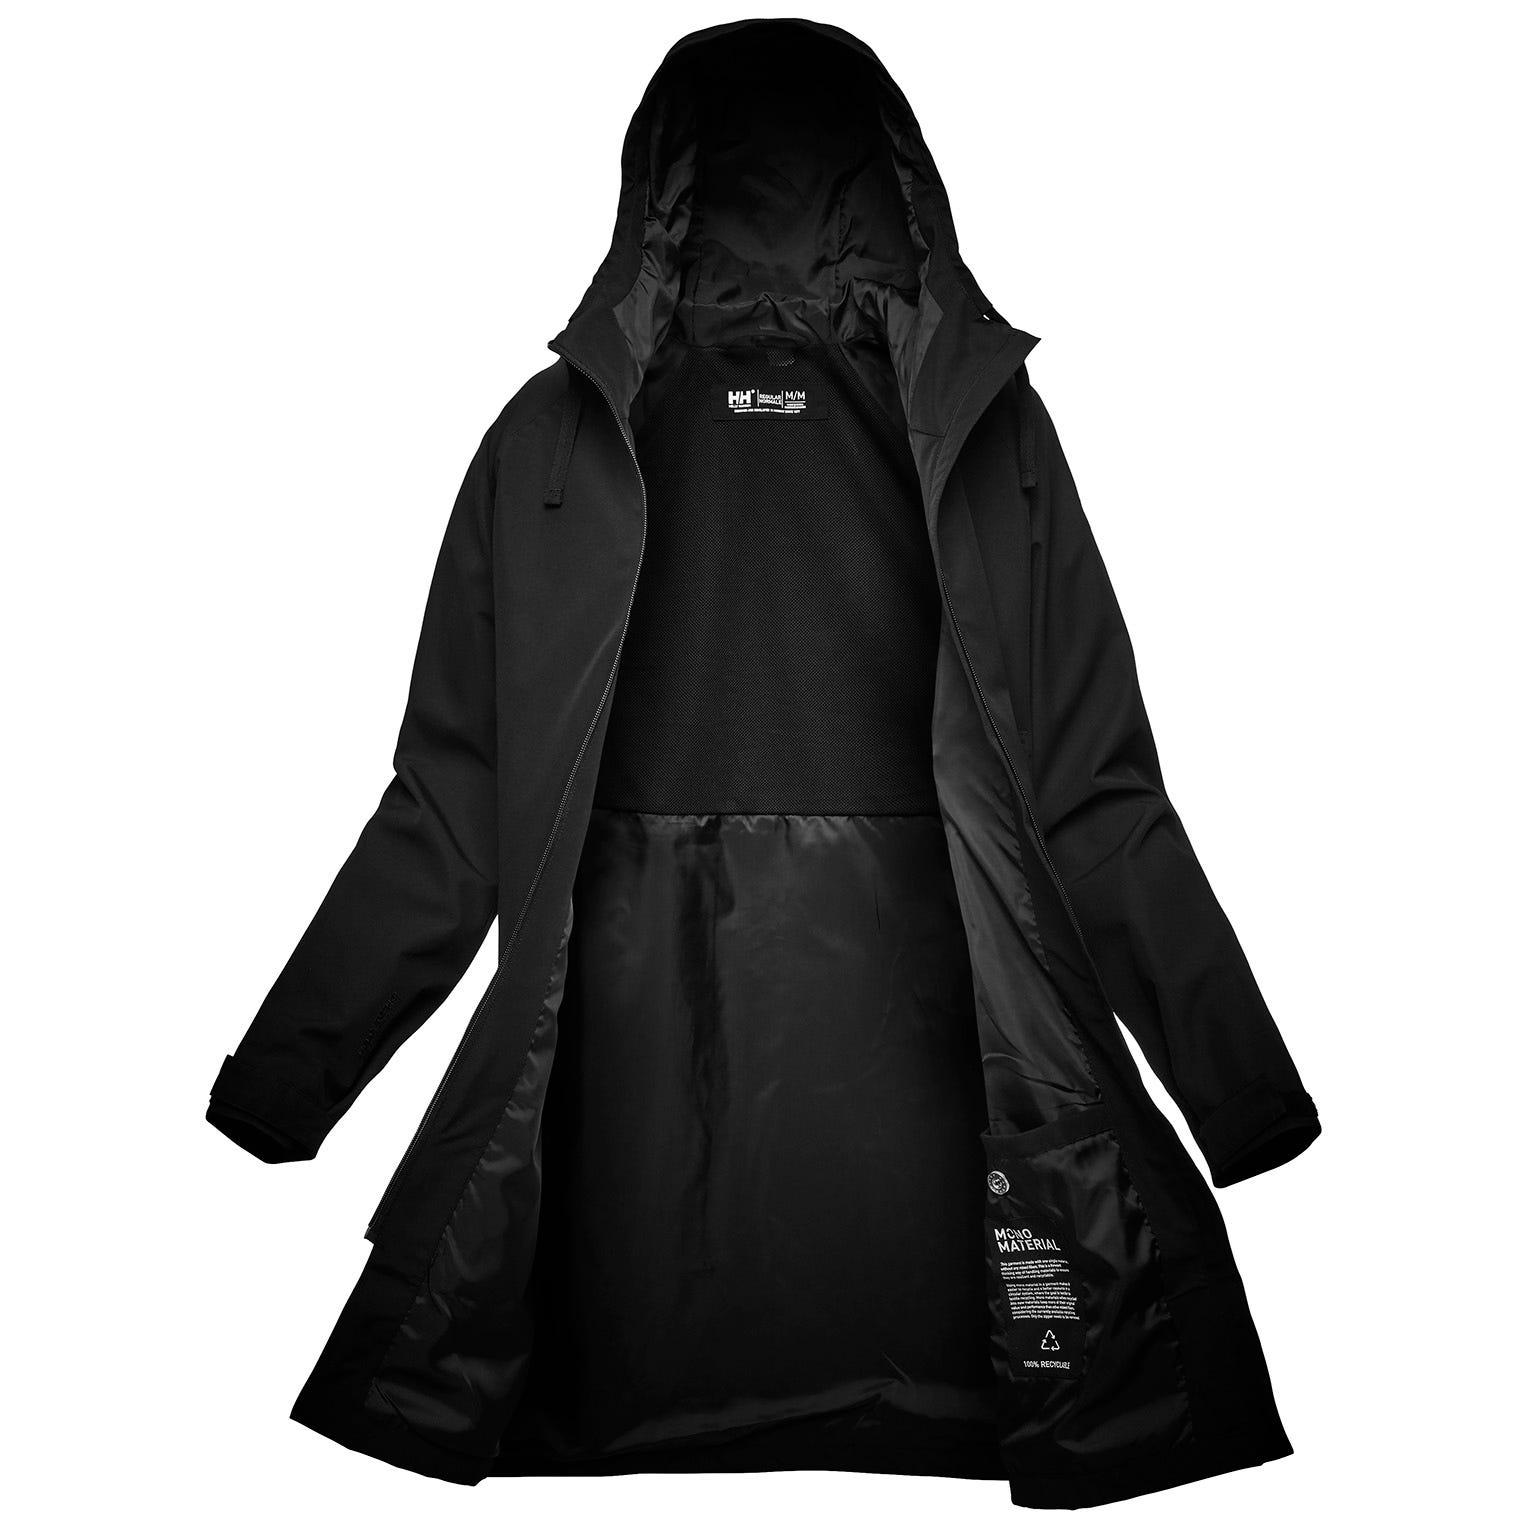 Helly Hansen Womens Mono Material Waterproof Raincoat XL